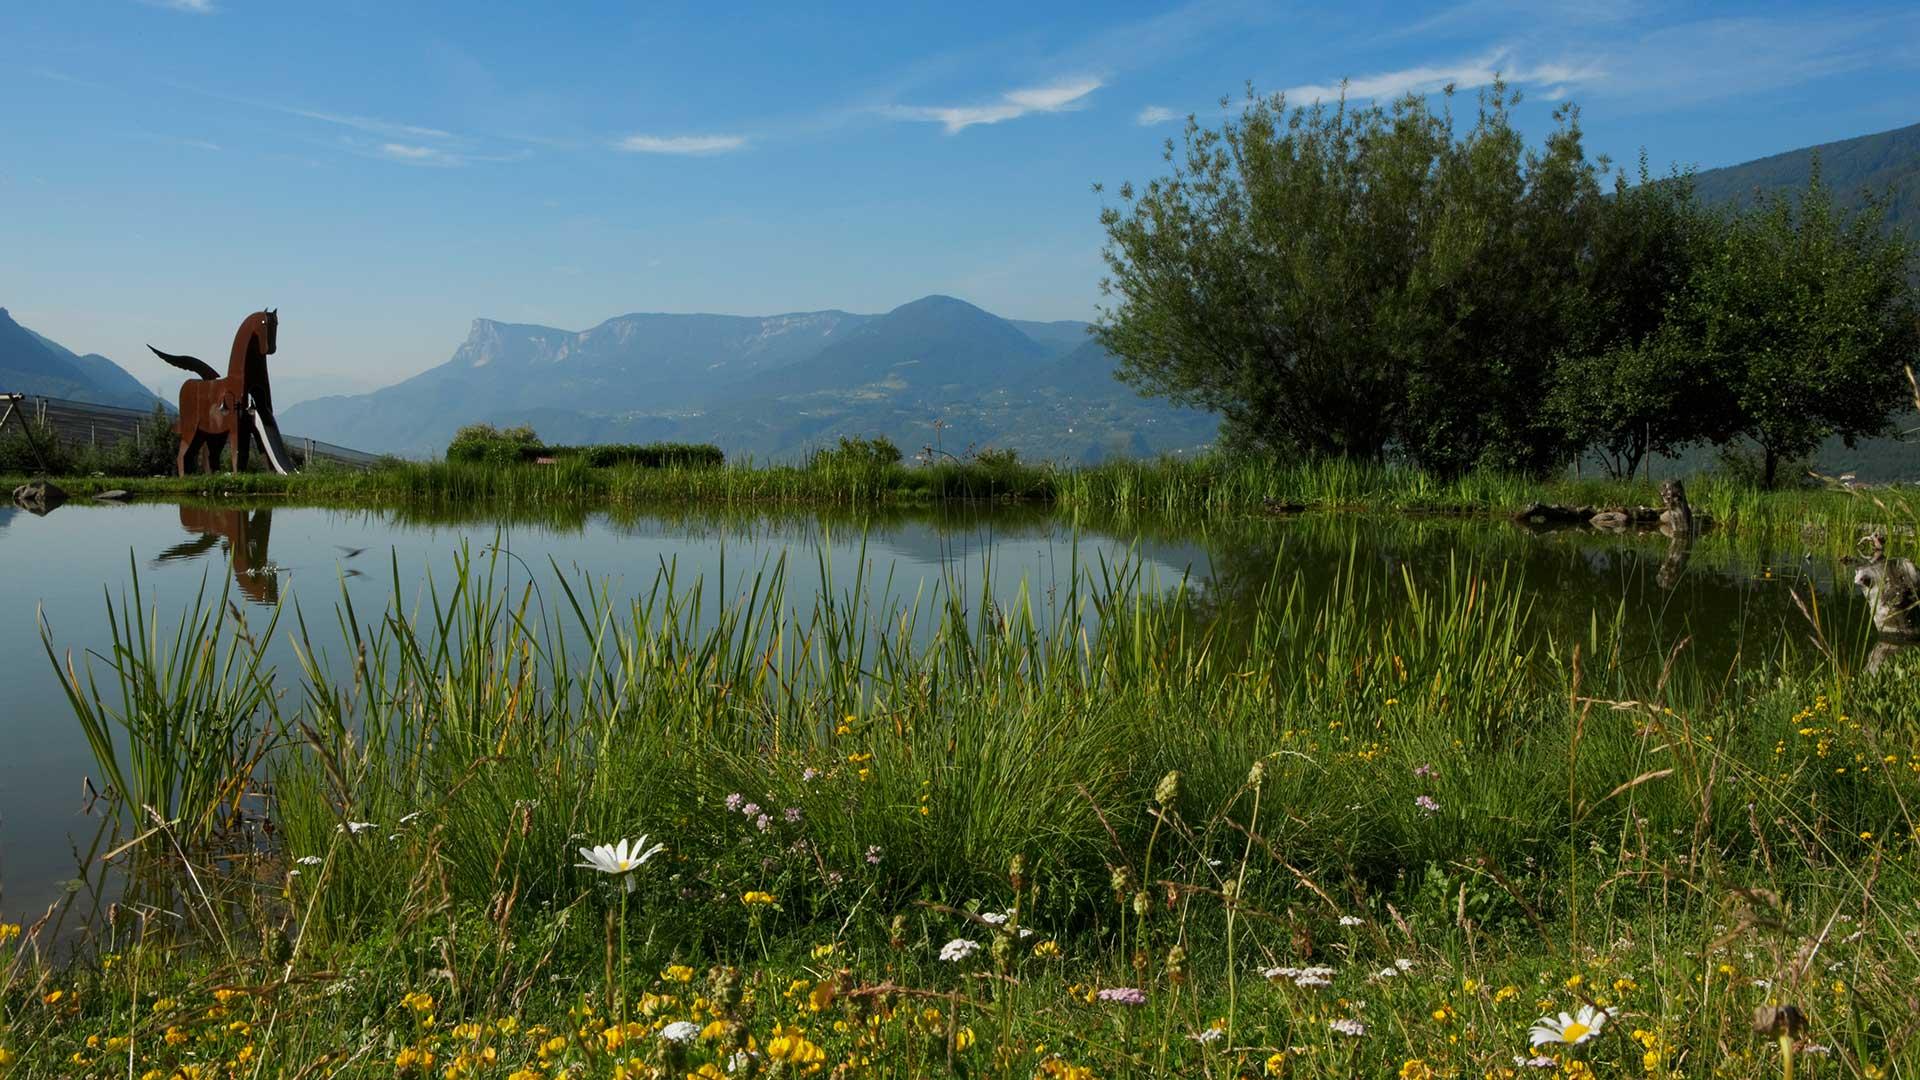 Paesaggio - Tirolo